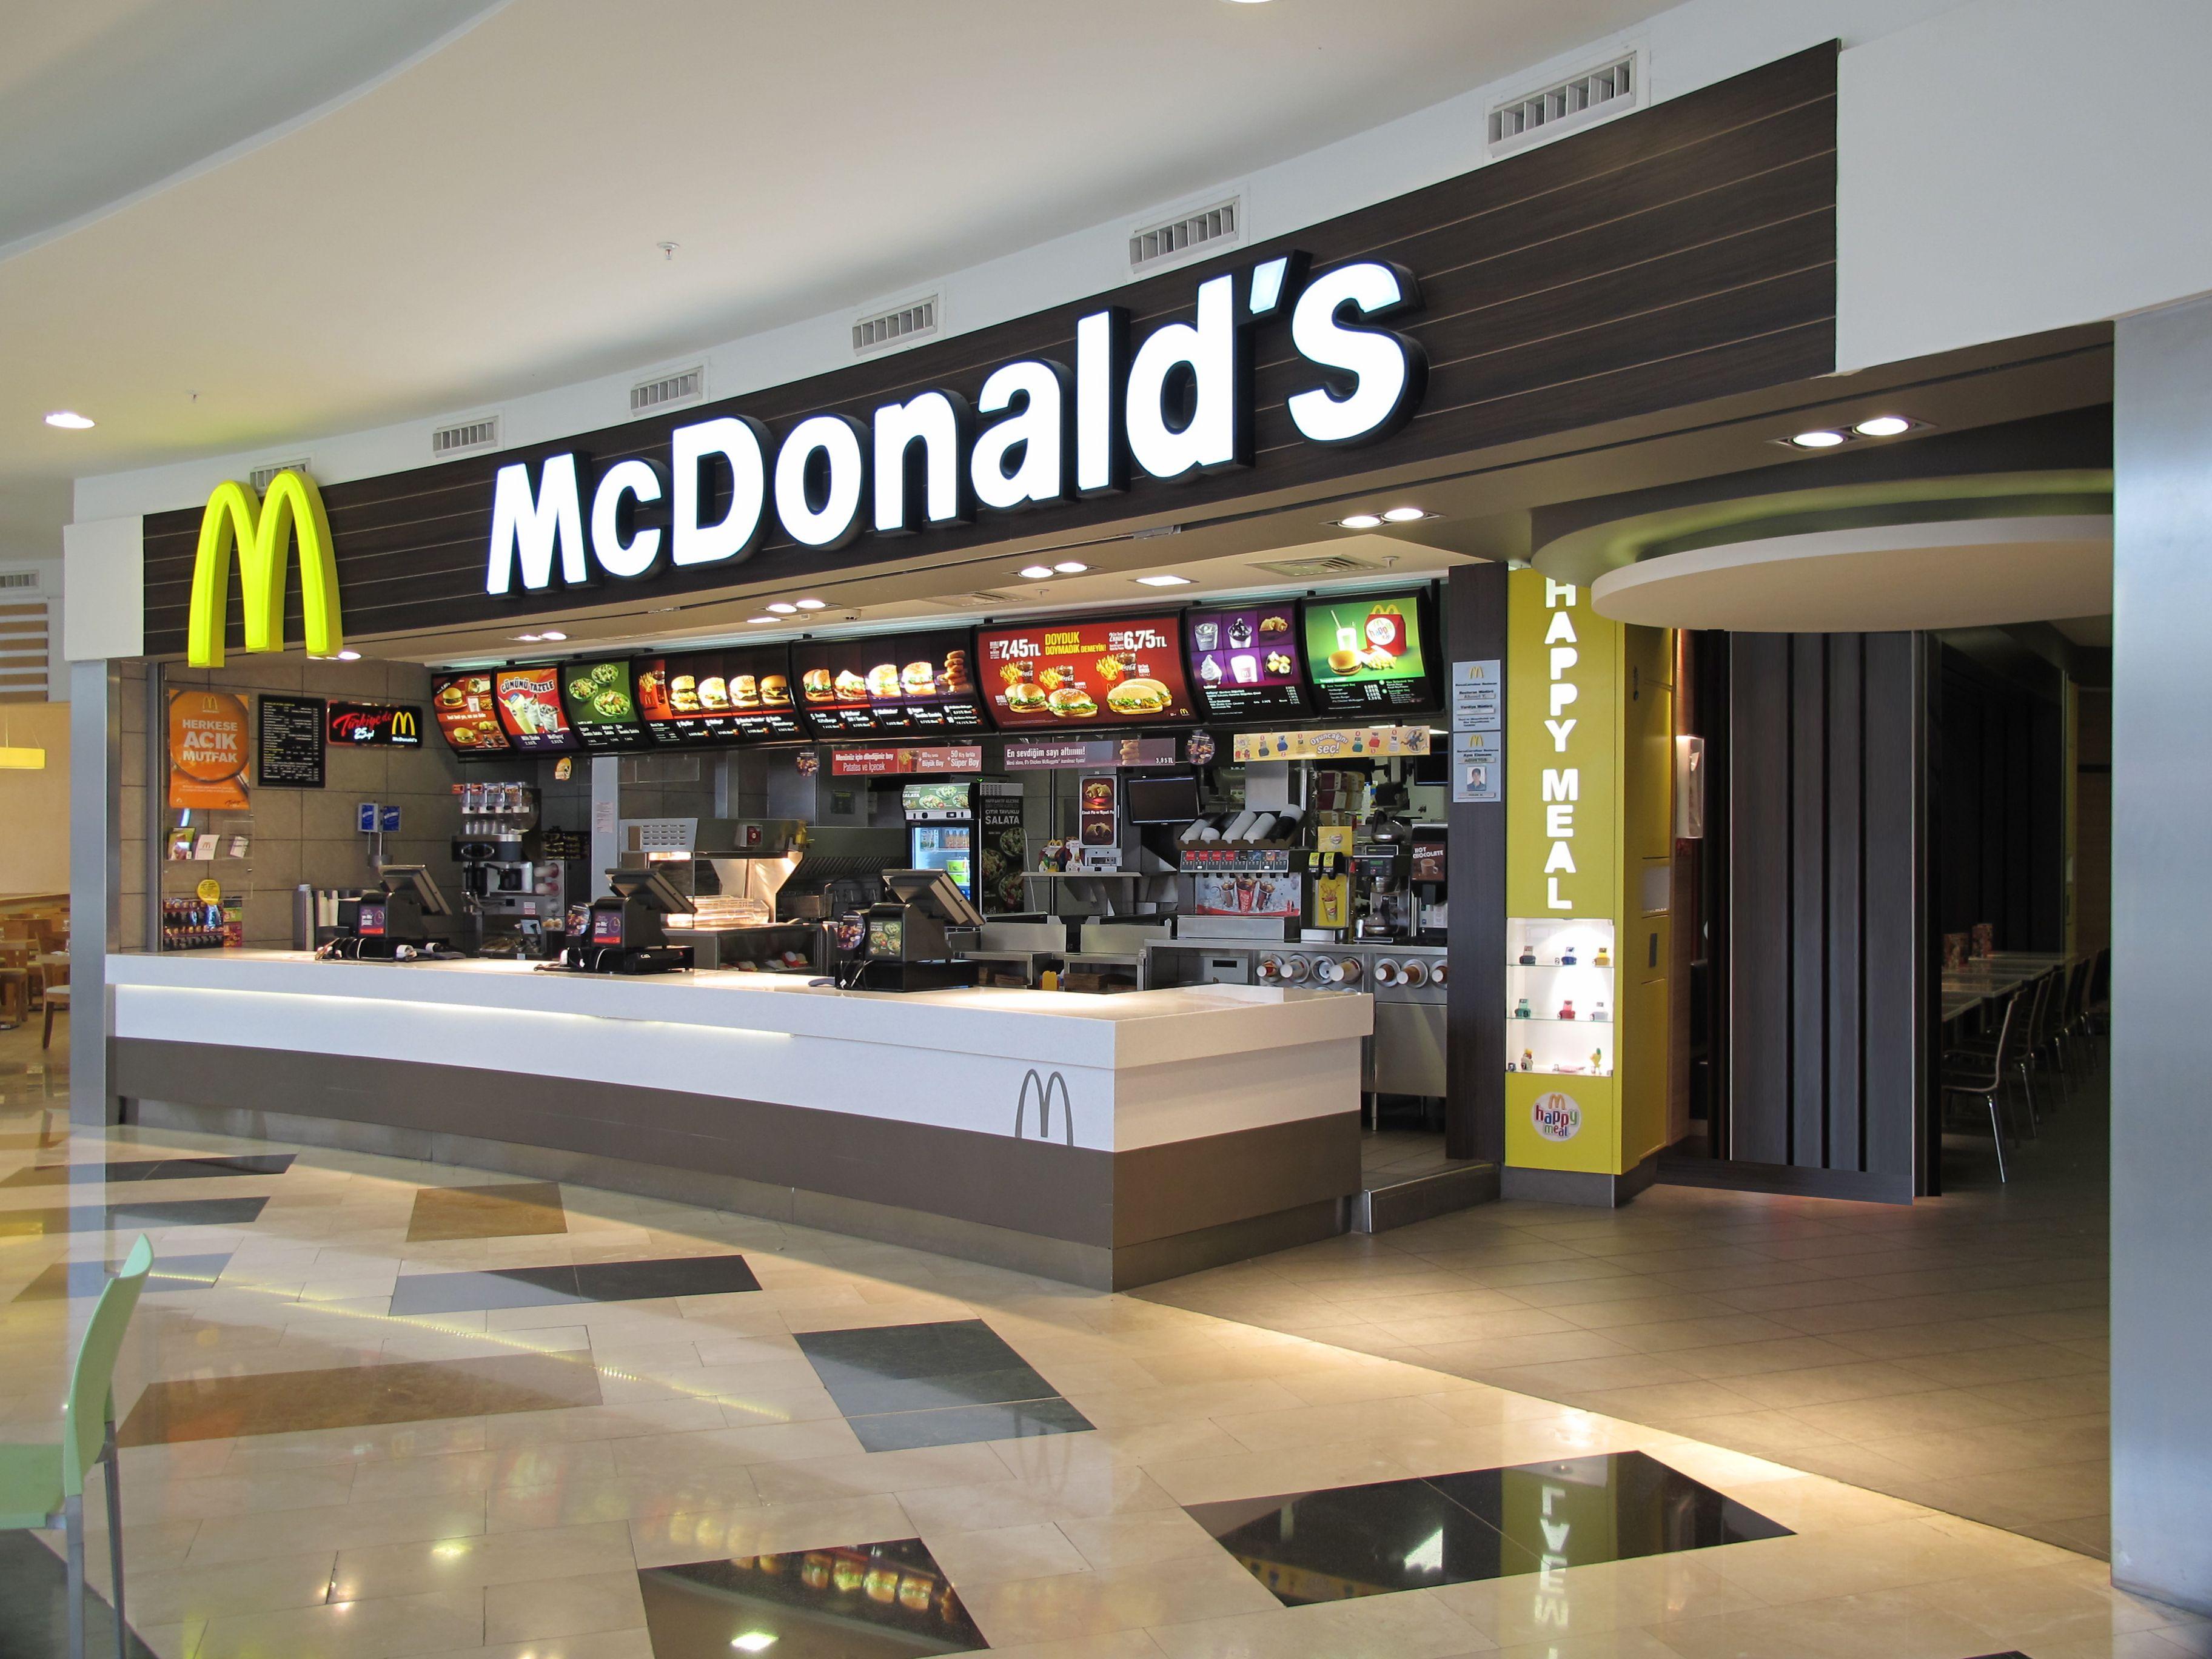 McDonald's Bursa Snap food, Fast food restaurant